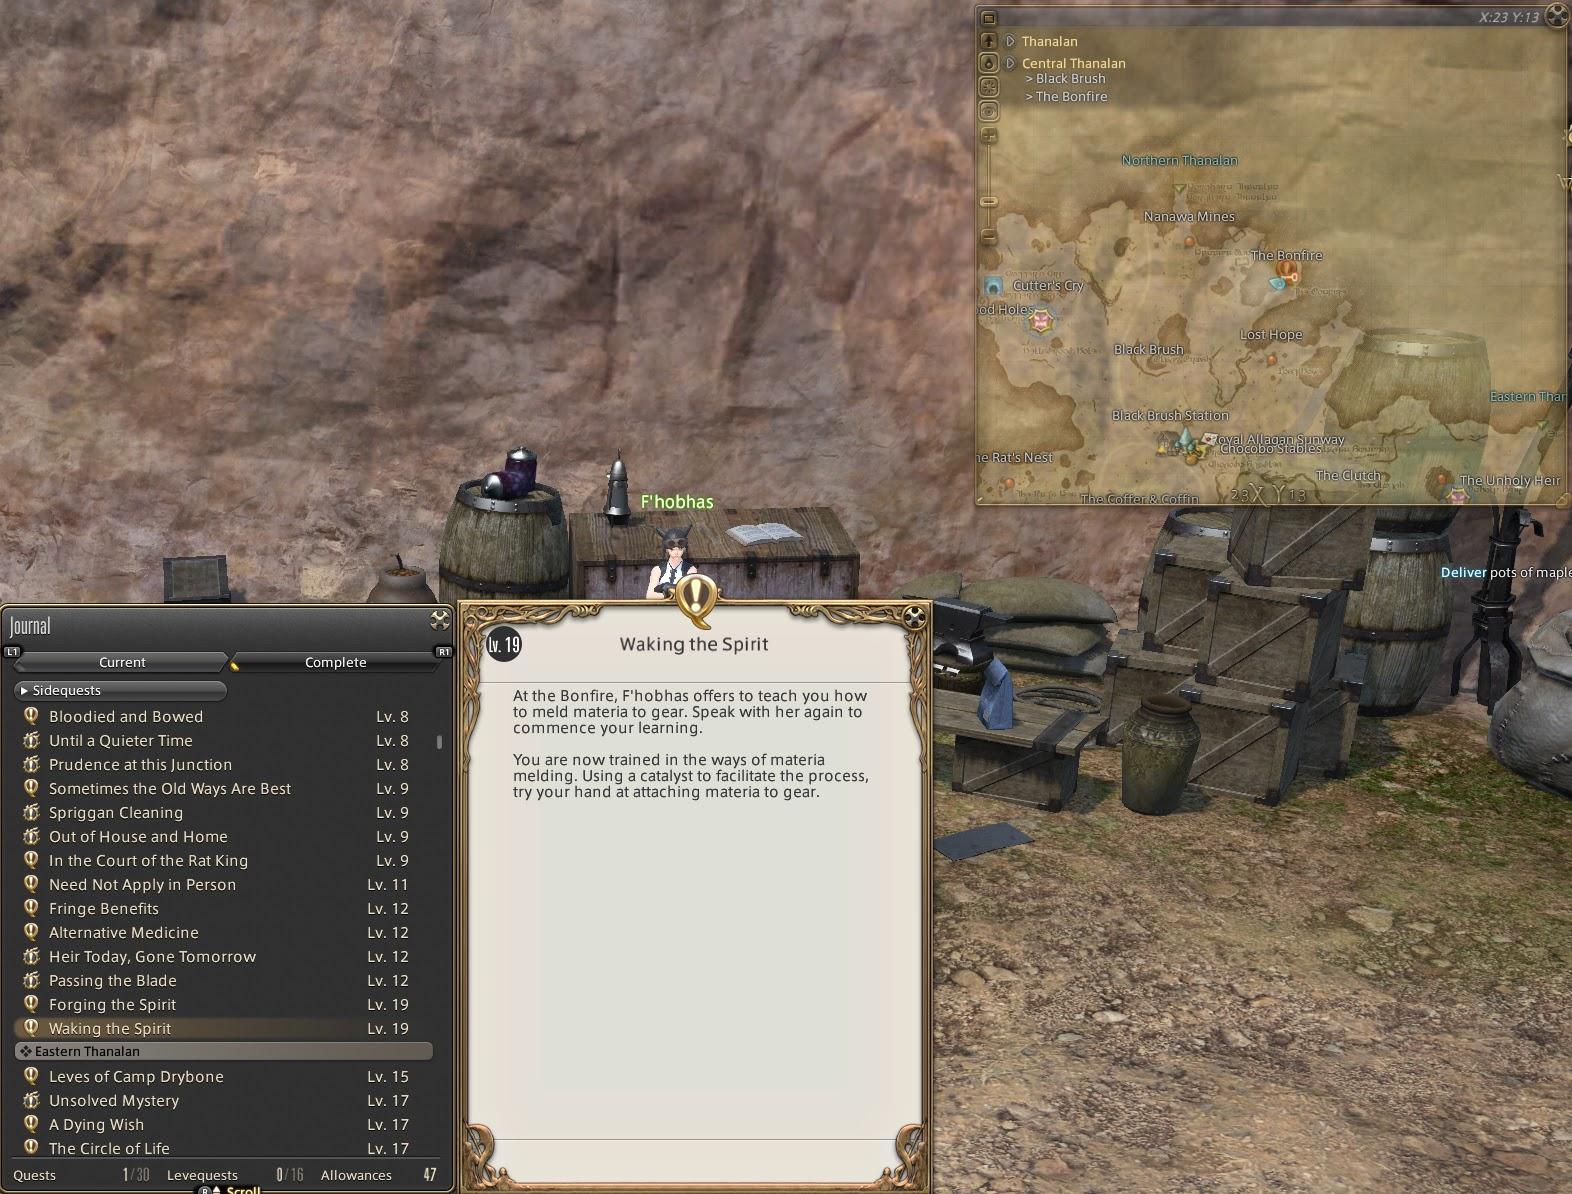 Vanh's Sandbox: Materia Melding